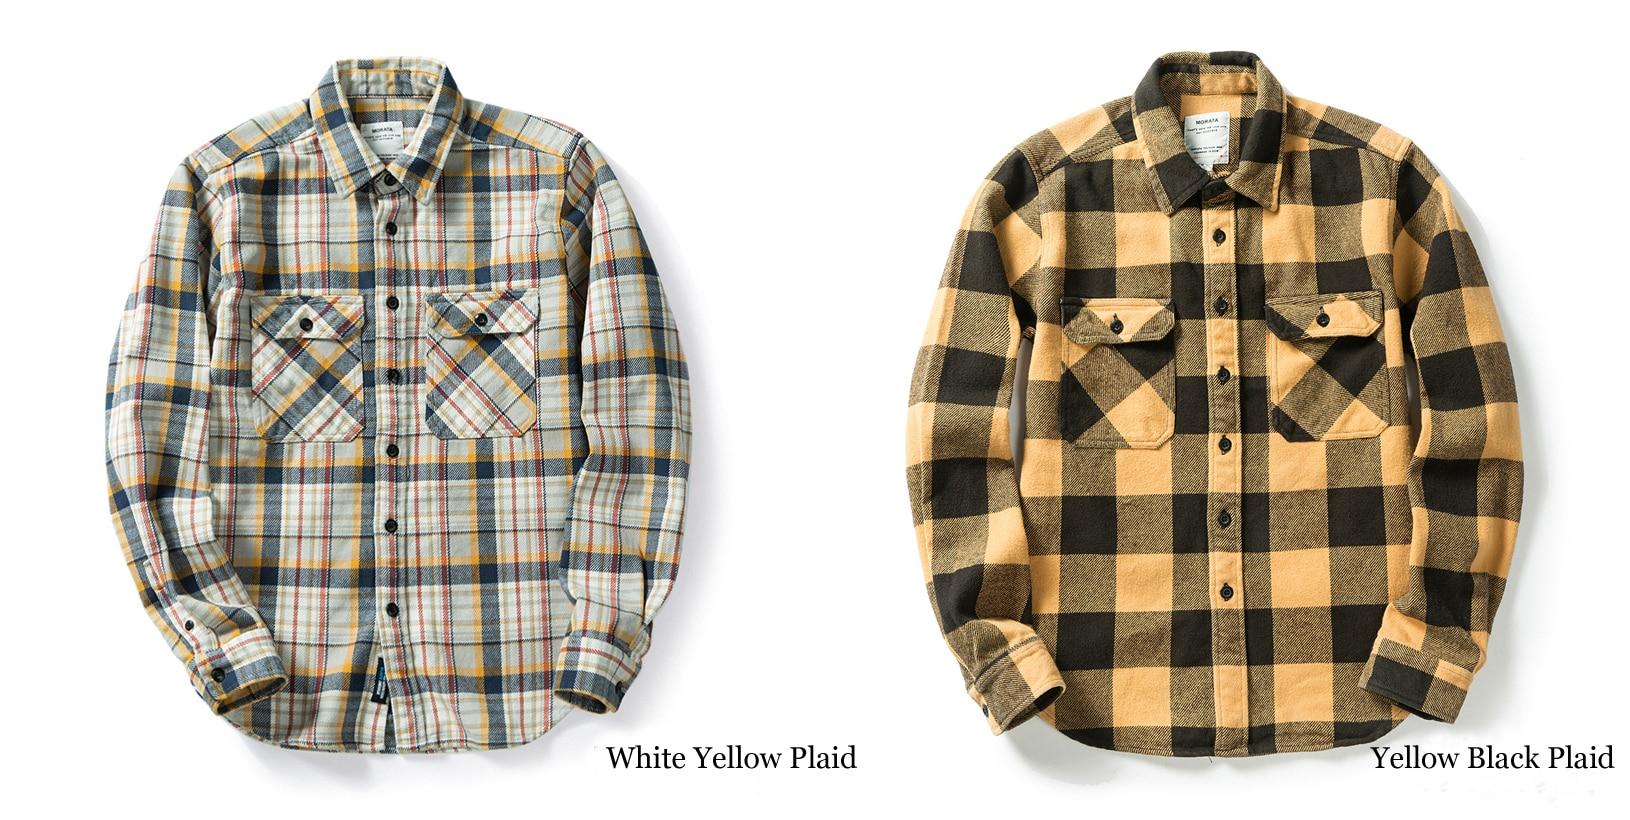 H60804d8b674749c5a8bc94881b6d29bcQ 100% cotton heavy weight retro vintage classic red black spring autumn winter long sleeve plaid shirt for men women